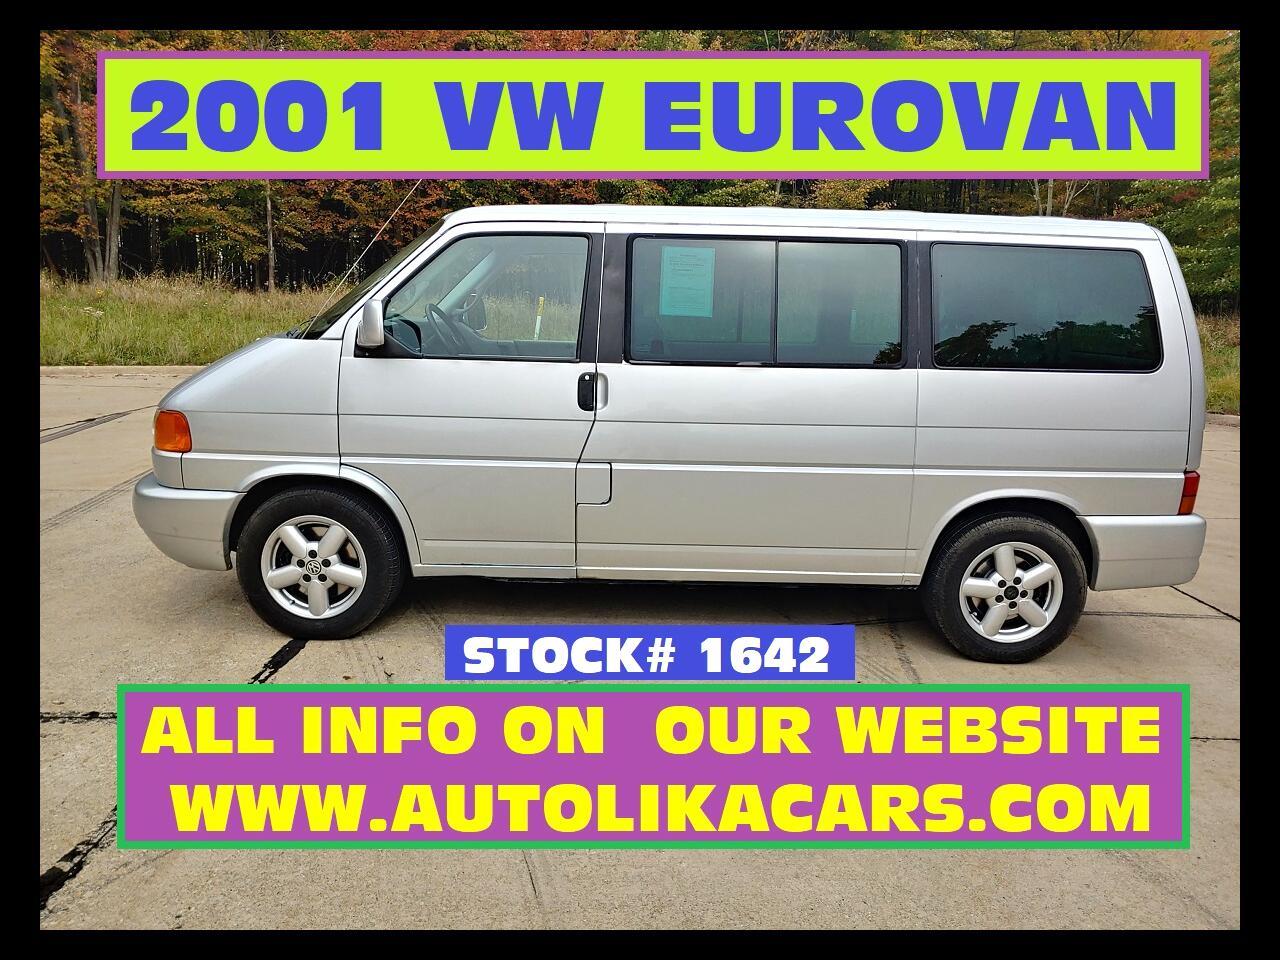 Volkswagen EuroVan 3dr MV 2001